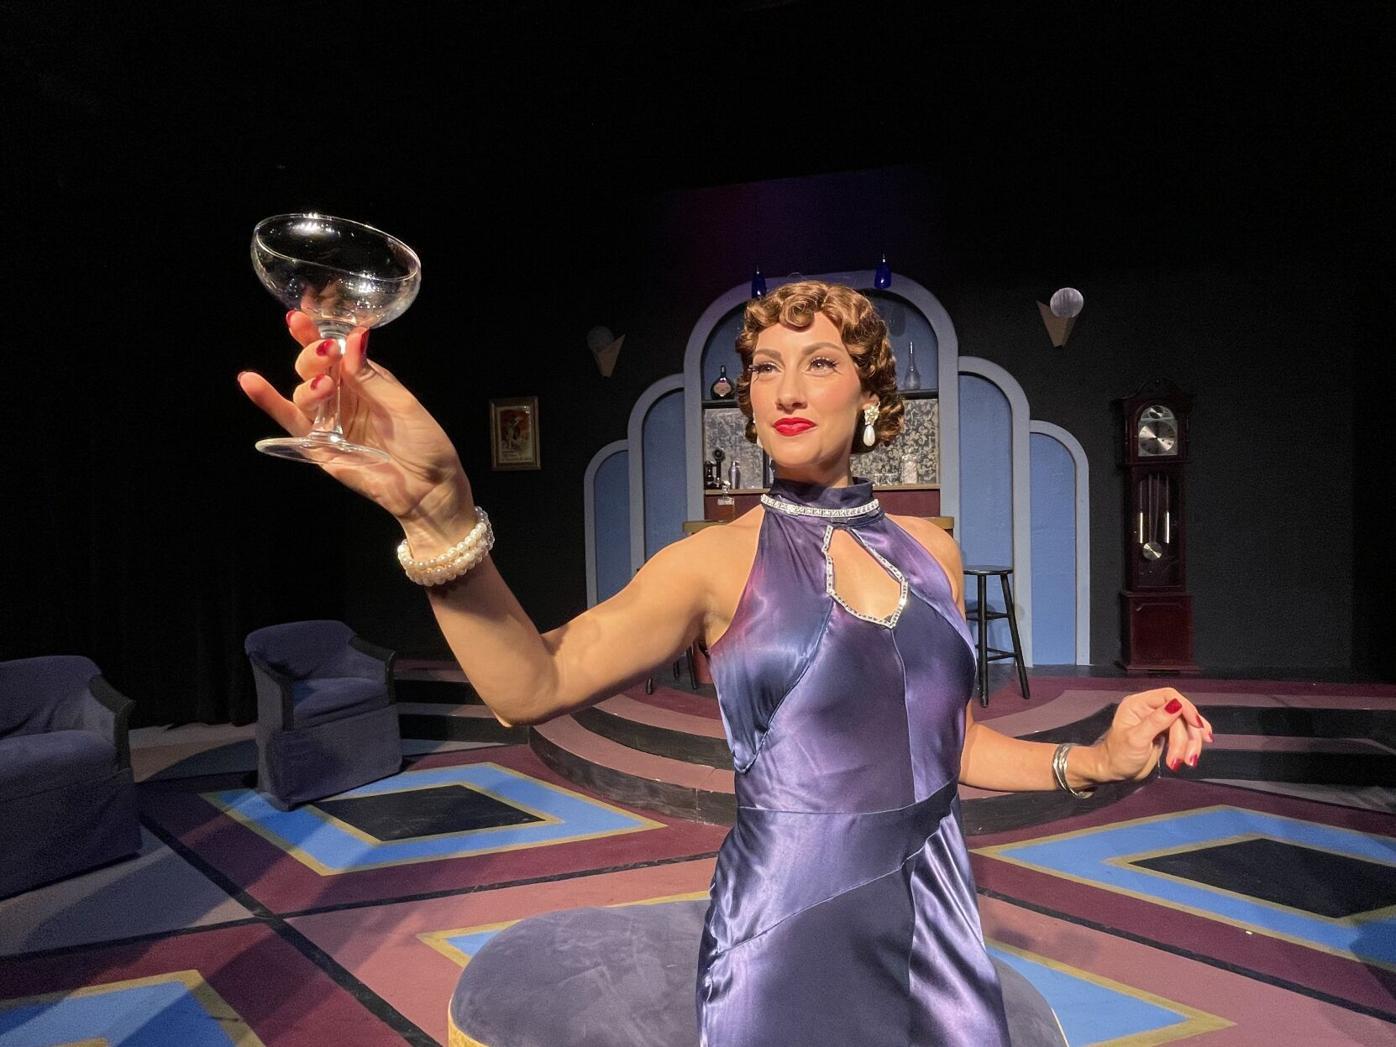 1930s woman raises glass